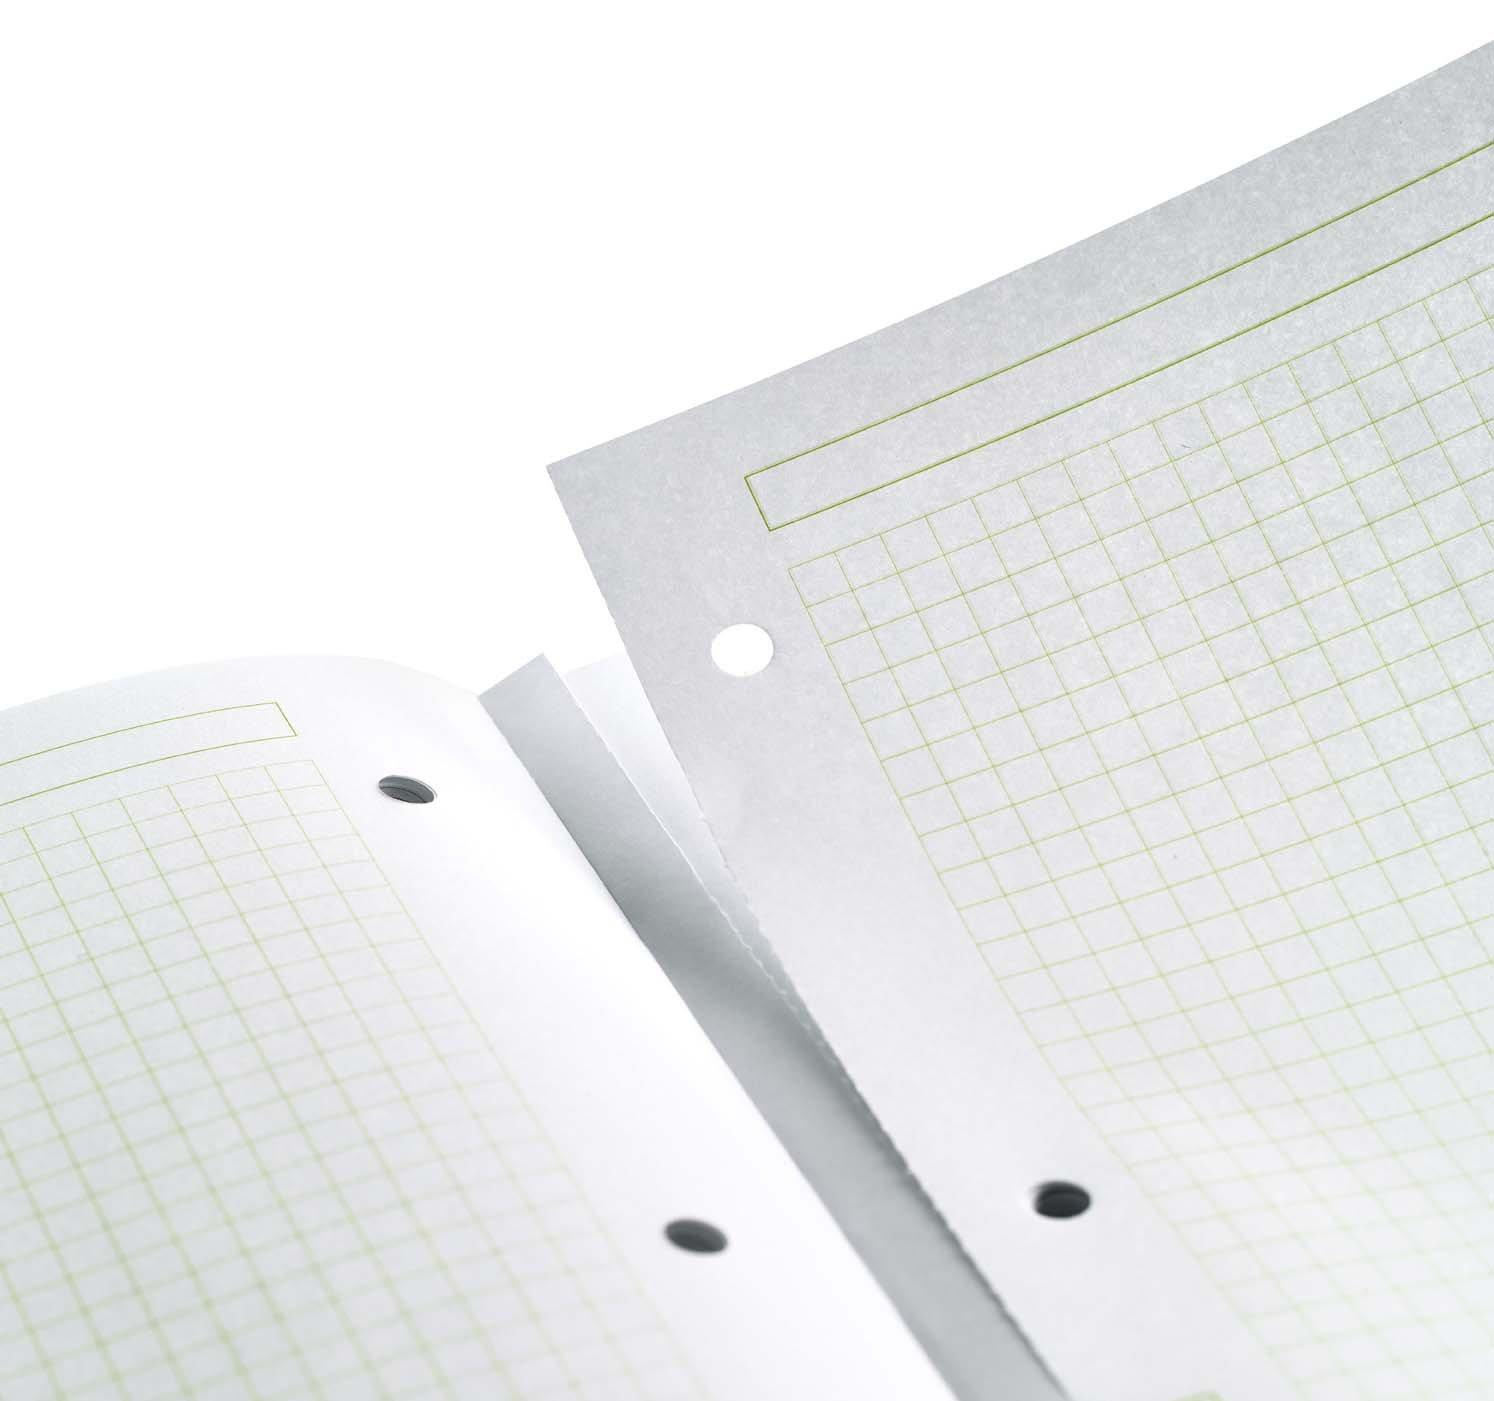 Miquelrius 8.25 X 11.75 A4 Wirebound Notebook, 6-Subject, Graph Paper, Black